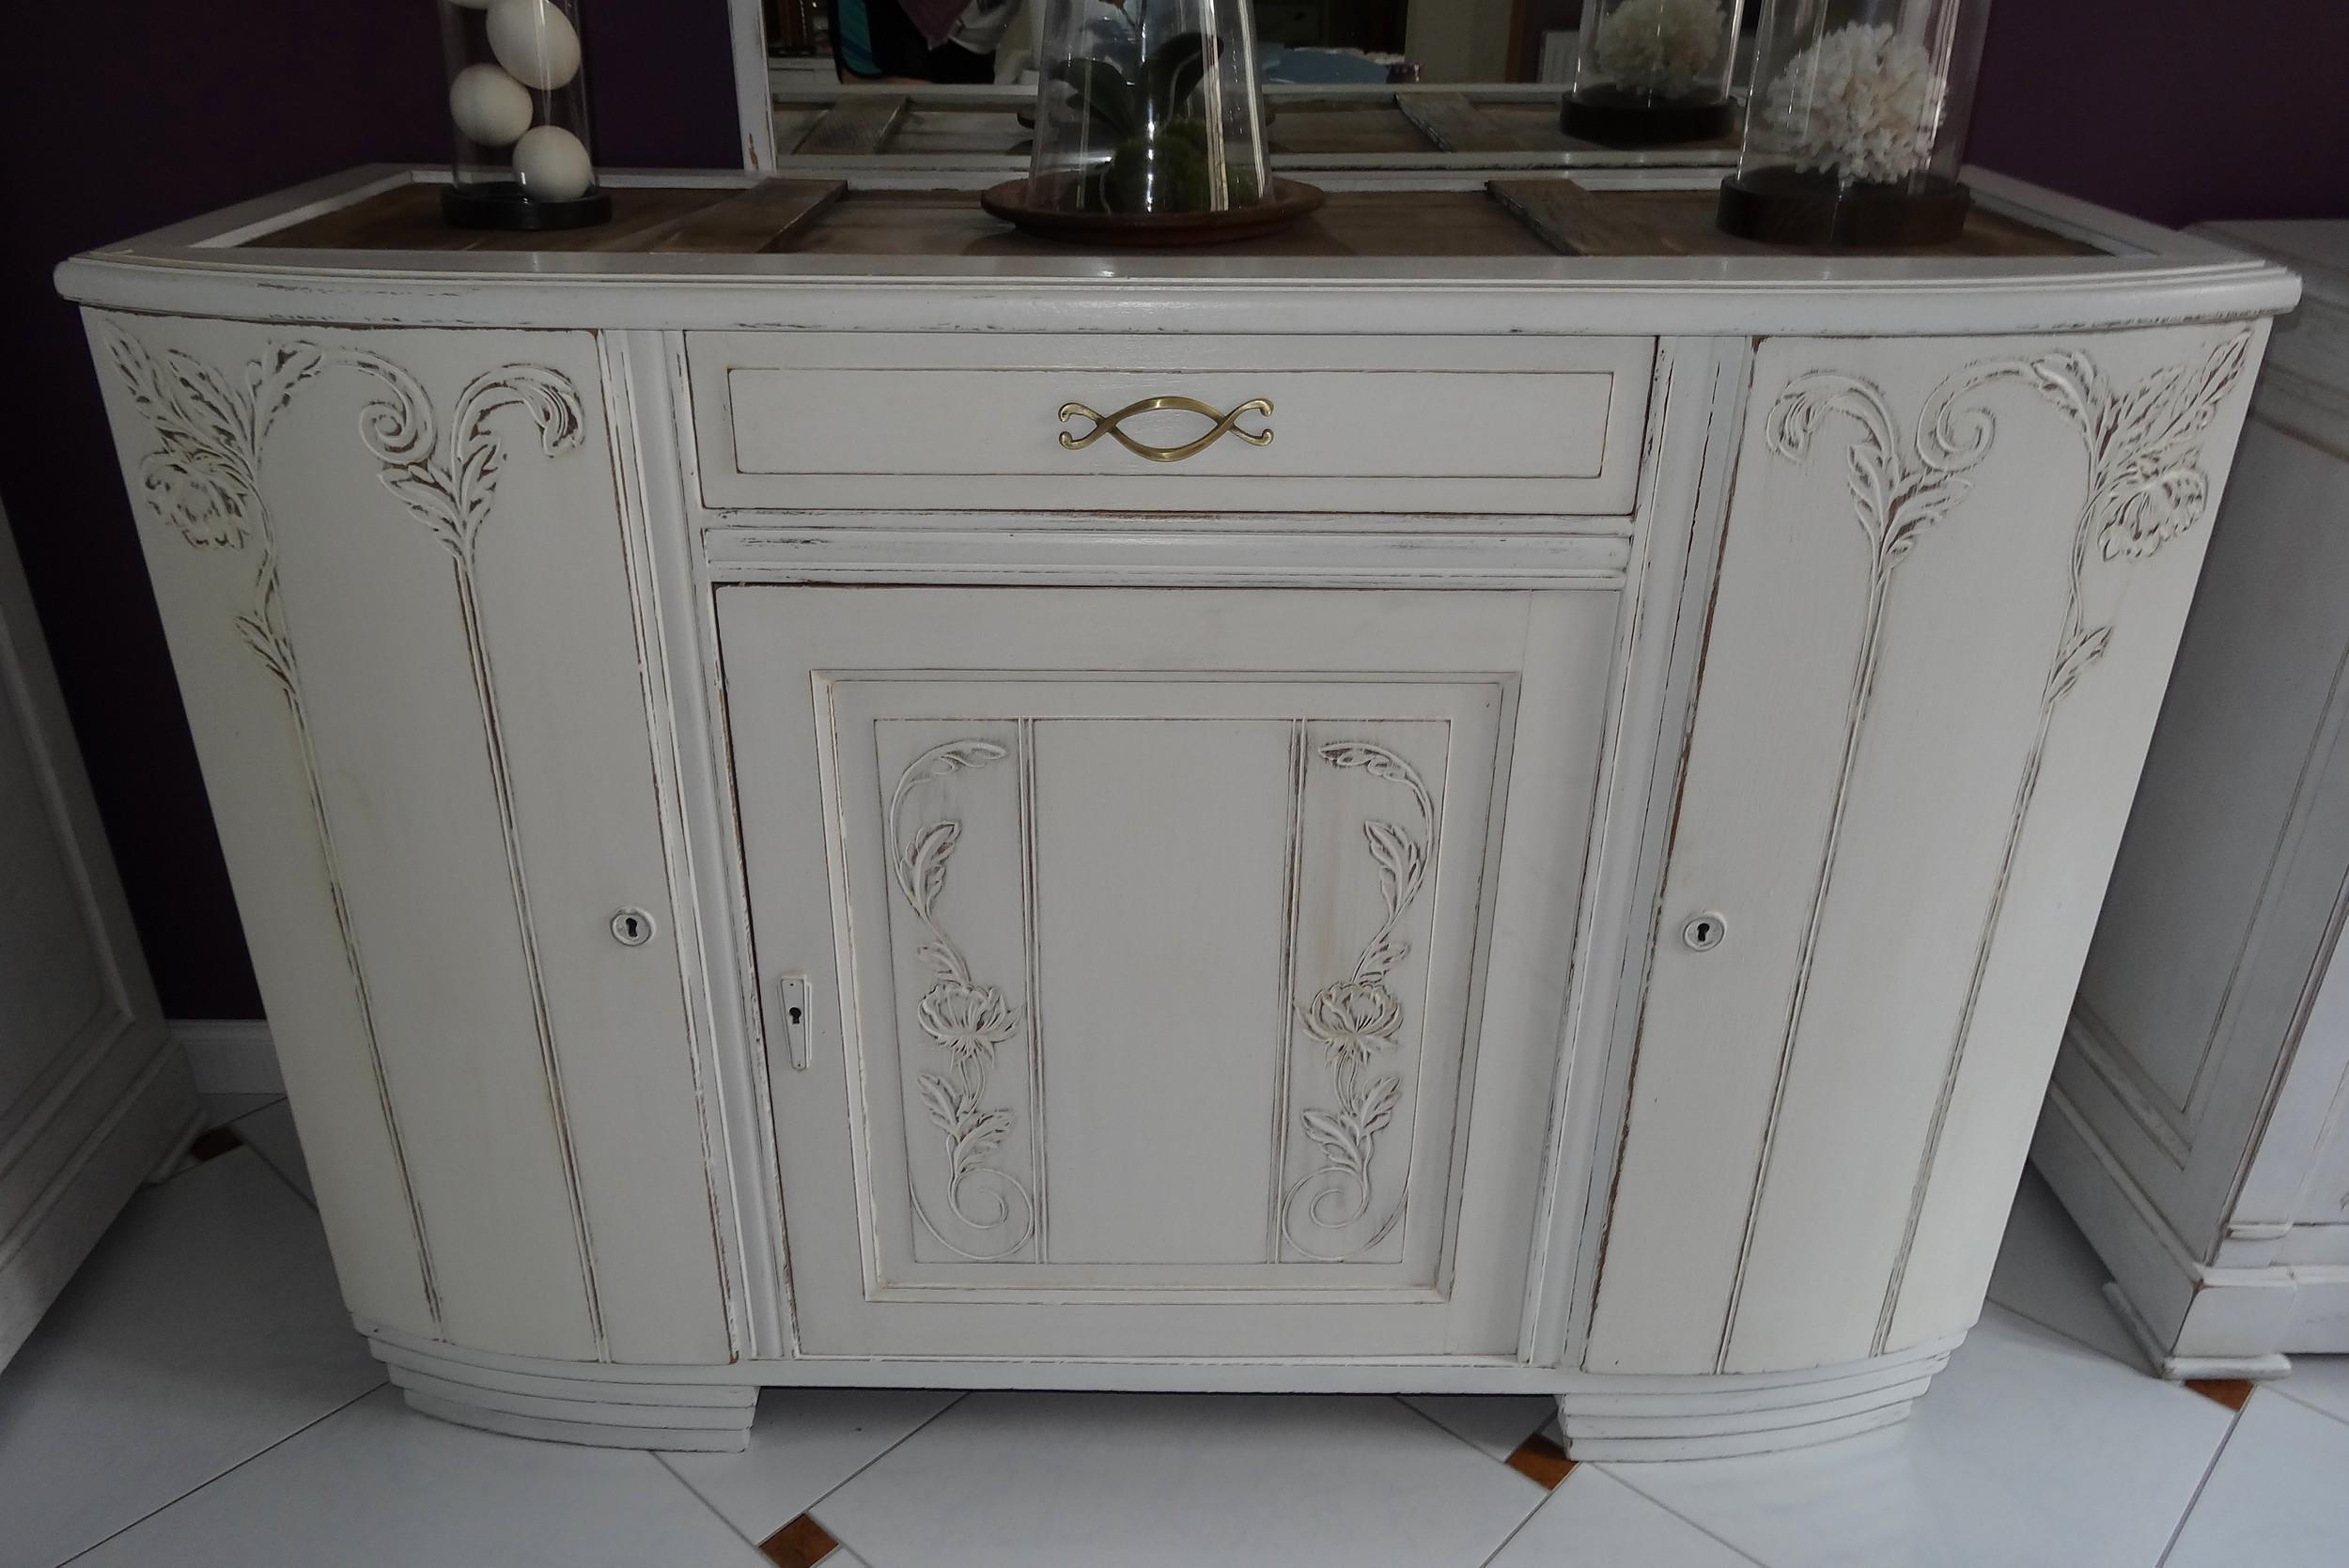 meuble bahut ann es 30 patin blanc anjoudeco. Black Bedroom Furniture Sets. Home Design Ideas